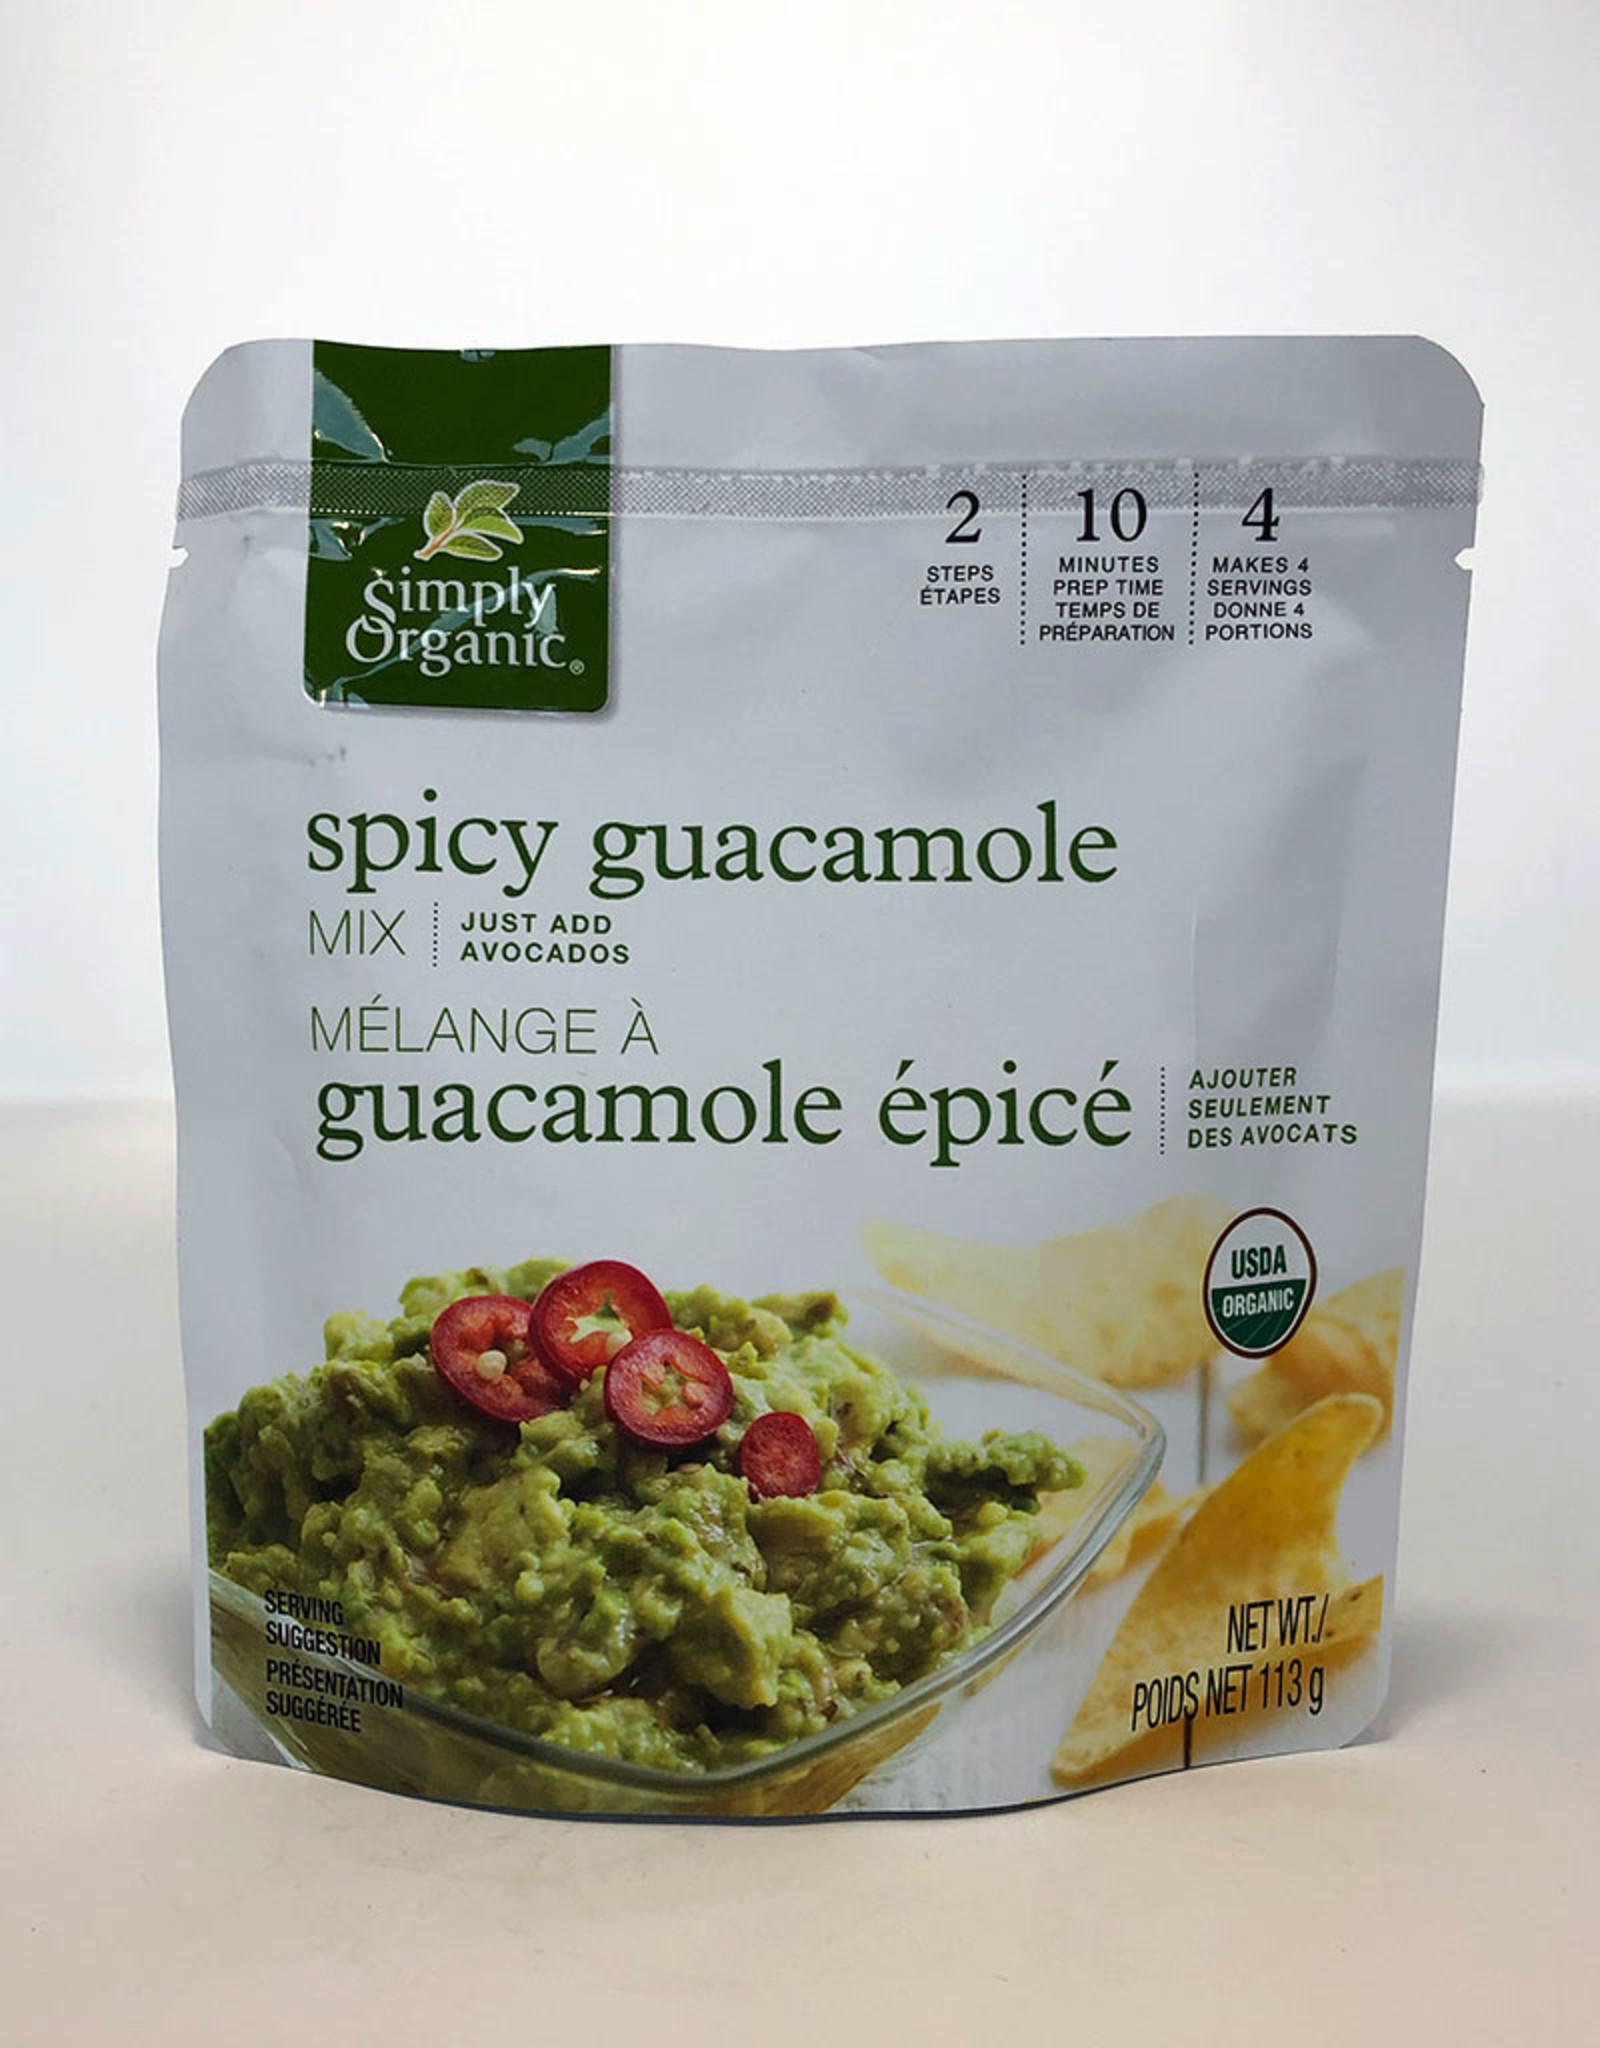 Simlpy Organic Simply Organic - Guacamole Mix, Spicy (Pouch)